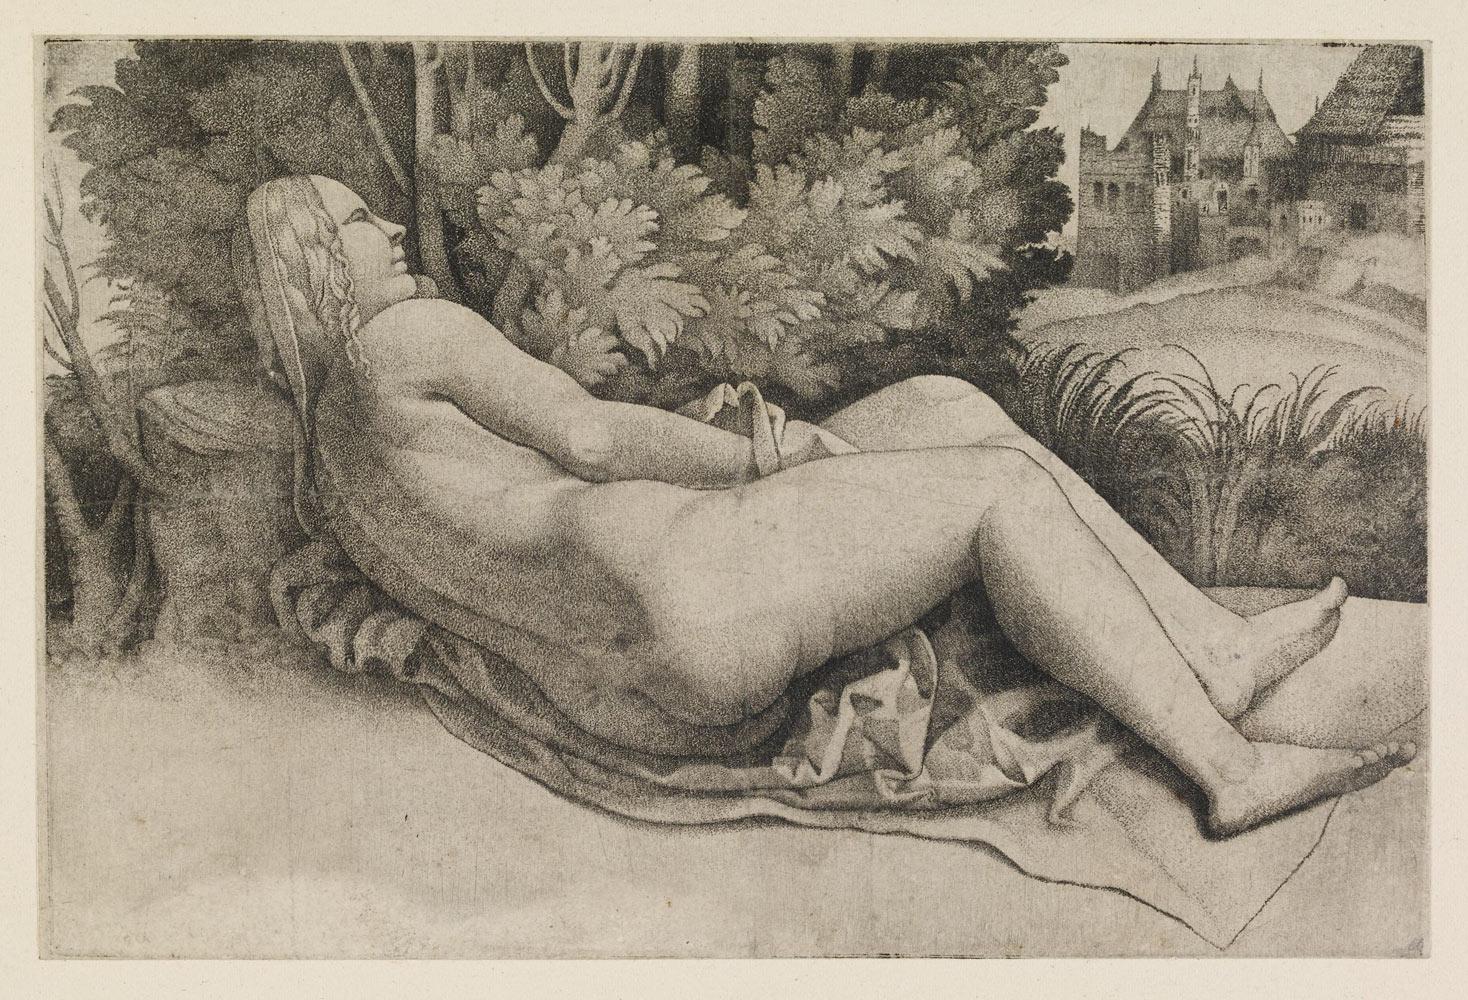 Giulio Campagnola, Venere in un paesaggio (1510-1515; incisione, 121 x 182 mm; Londra, British Museum)